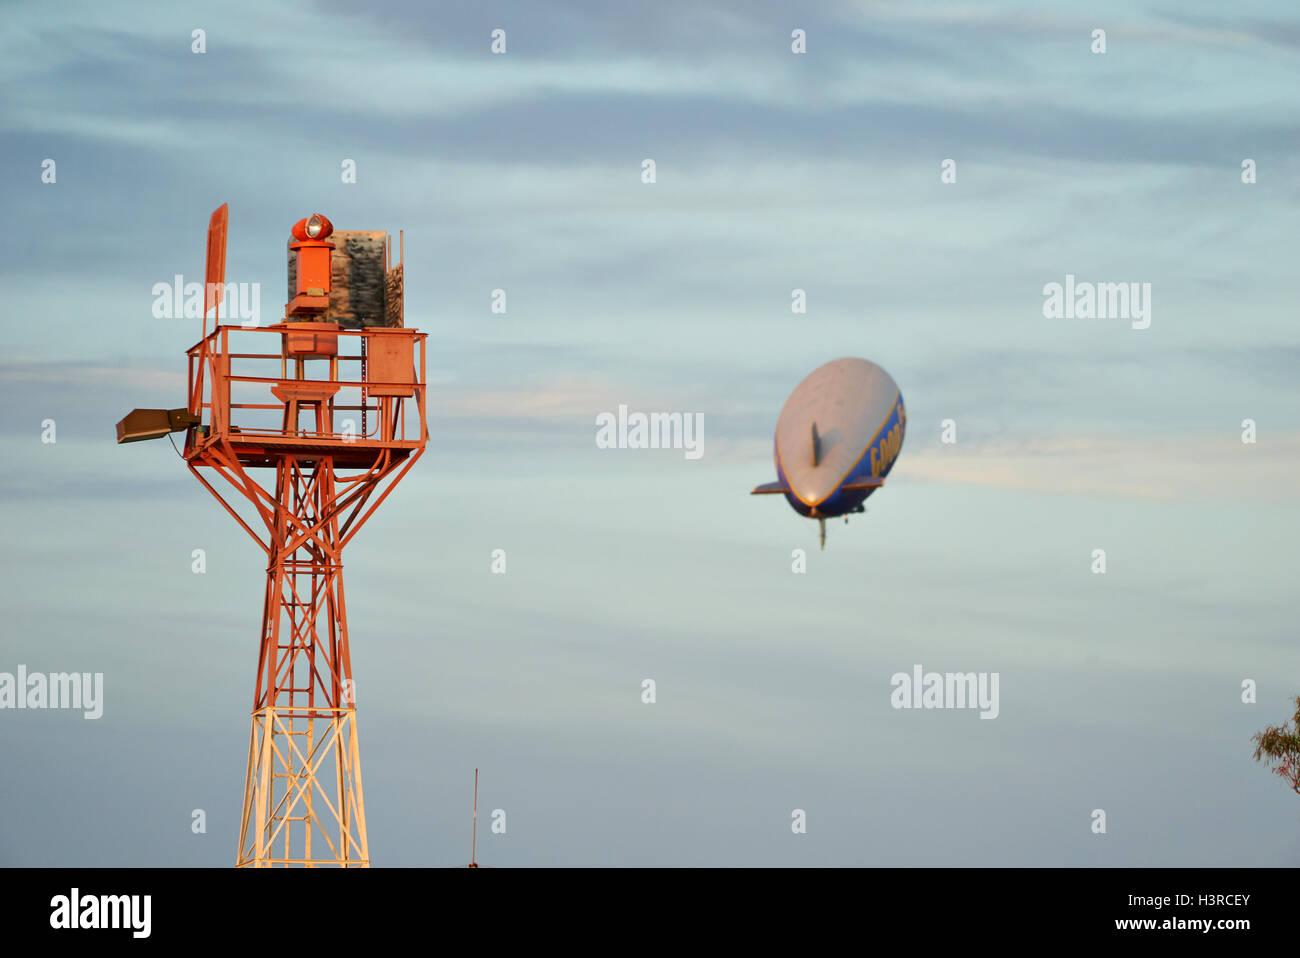 SANTA MONICA, CALIFORNIA USA - OCT 07, 2016: The Good Year blimp Zeppelin flies over airport - Stock Image